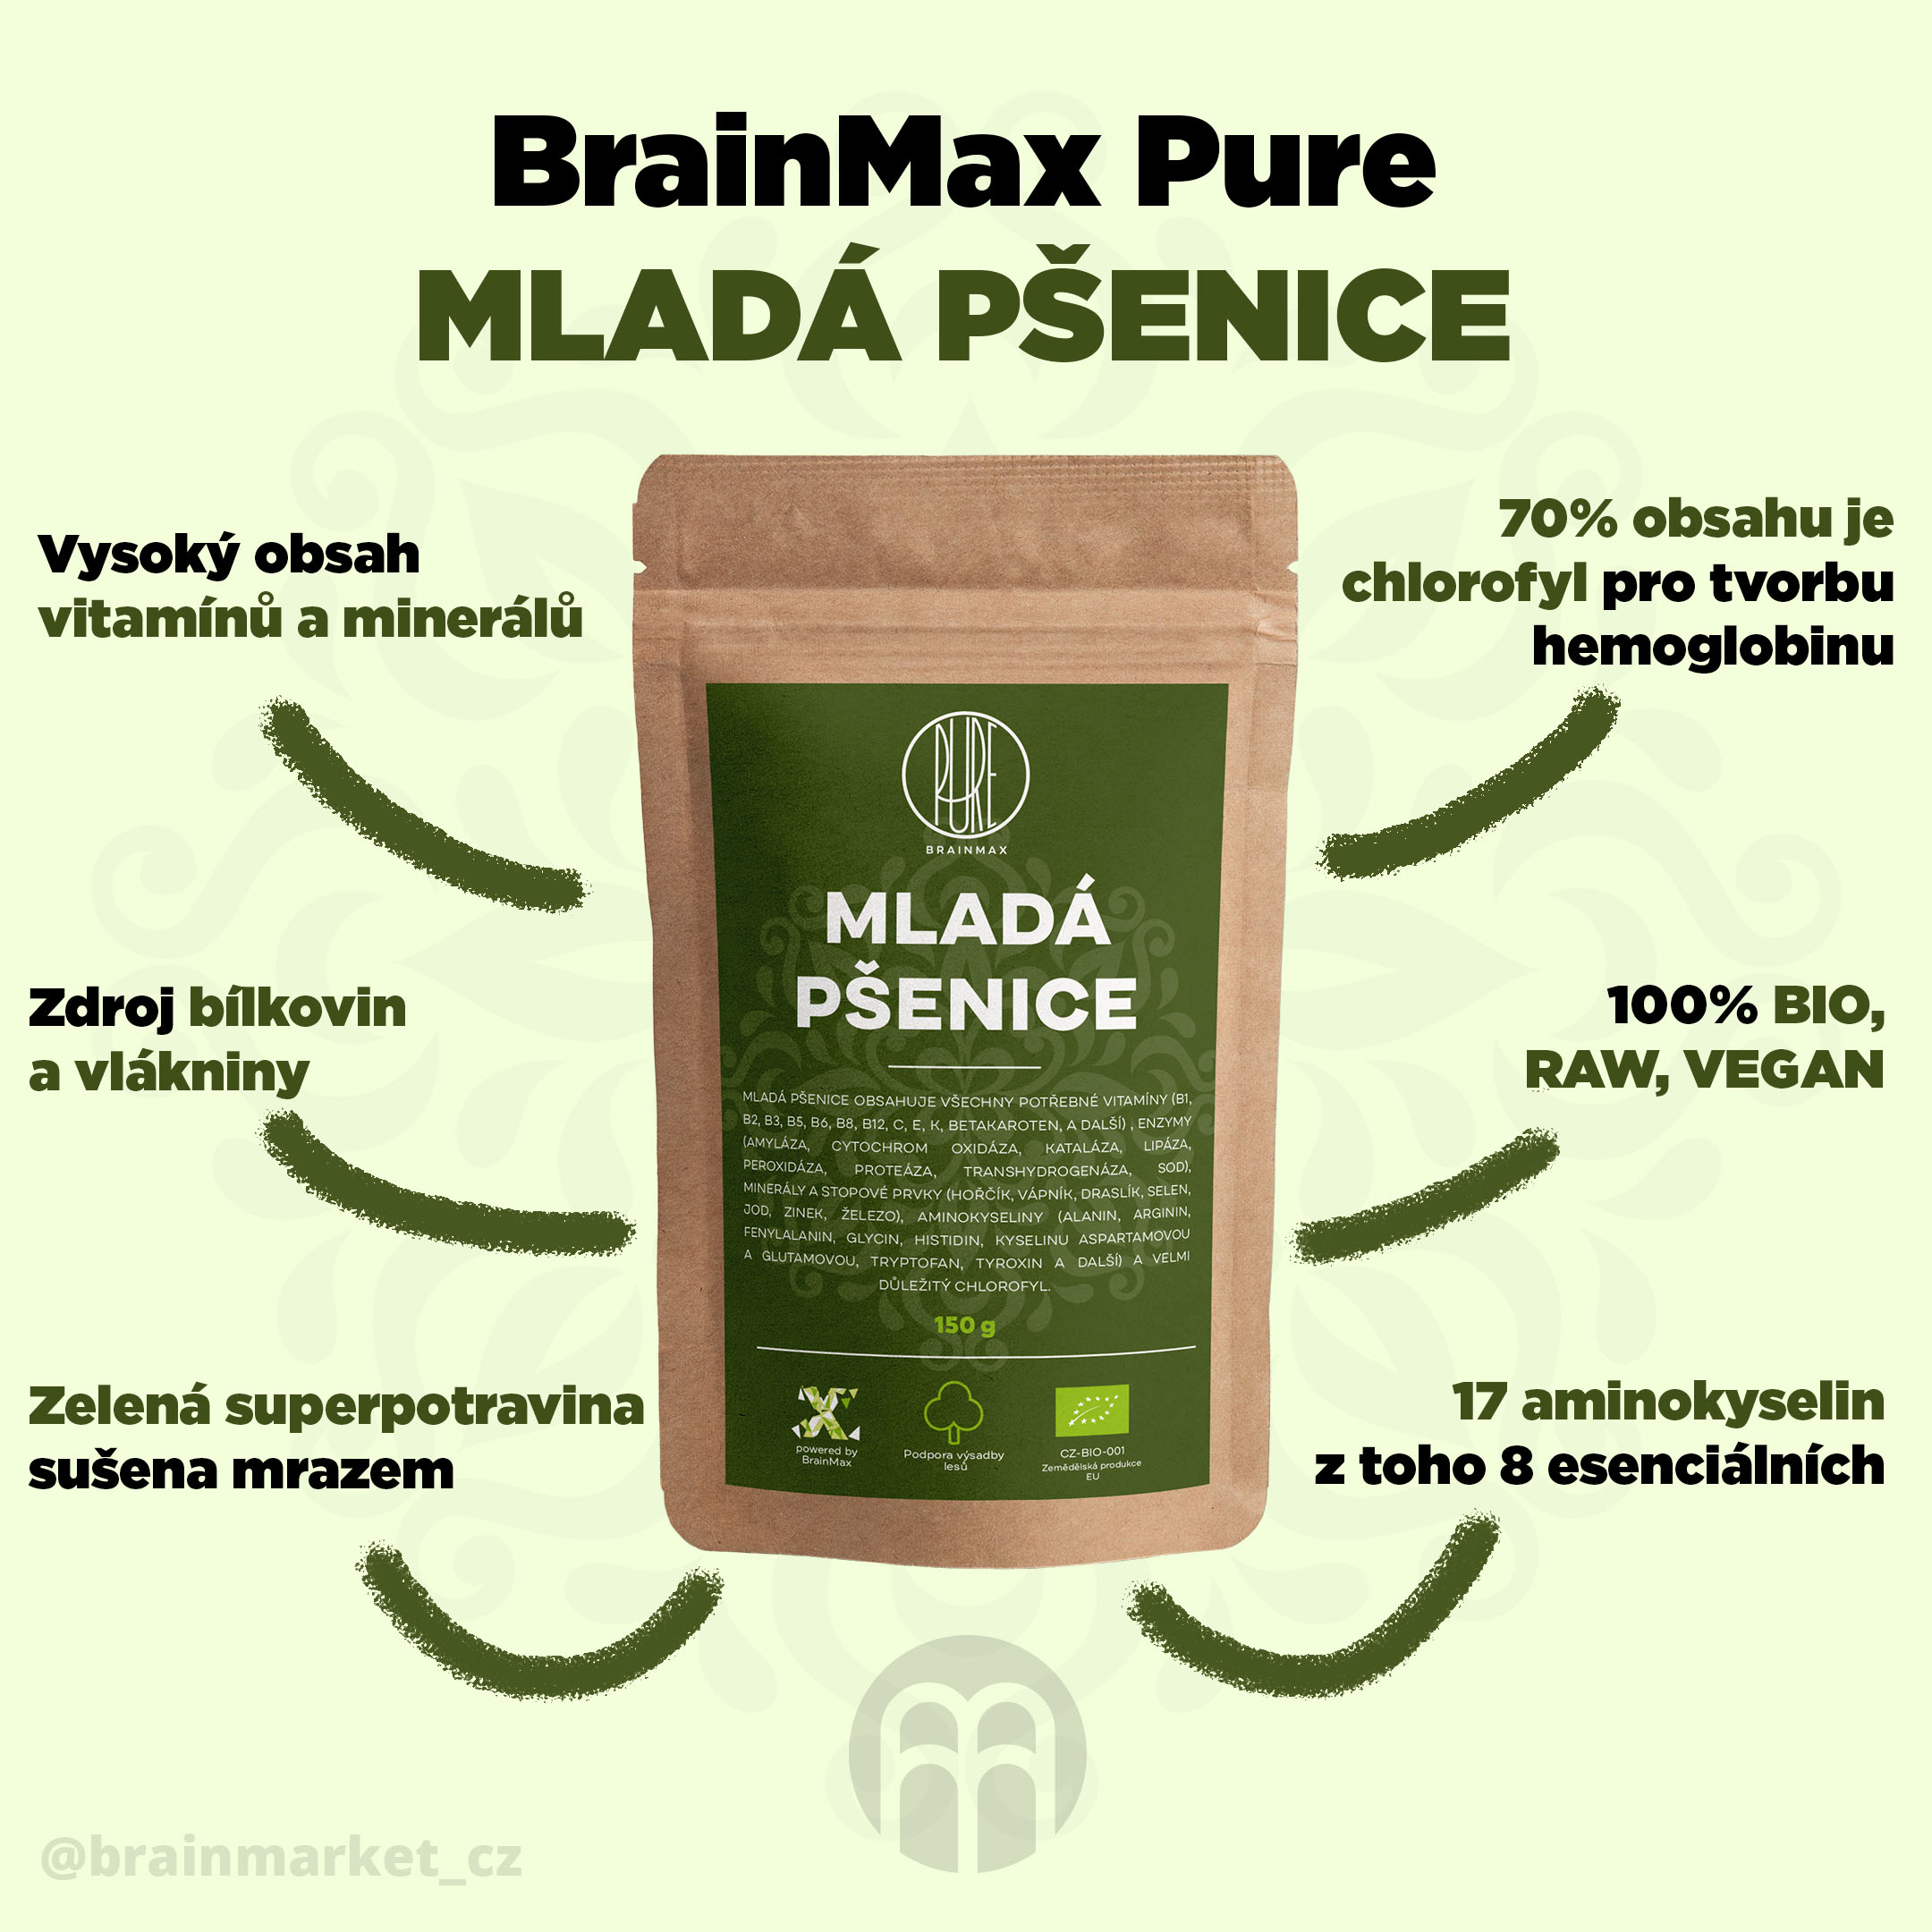 mlada-psenice-brainmax-pure-brainmarket-cz